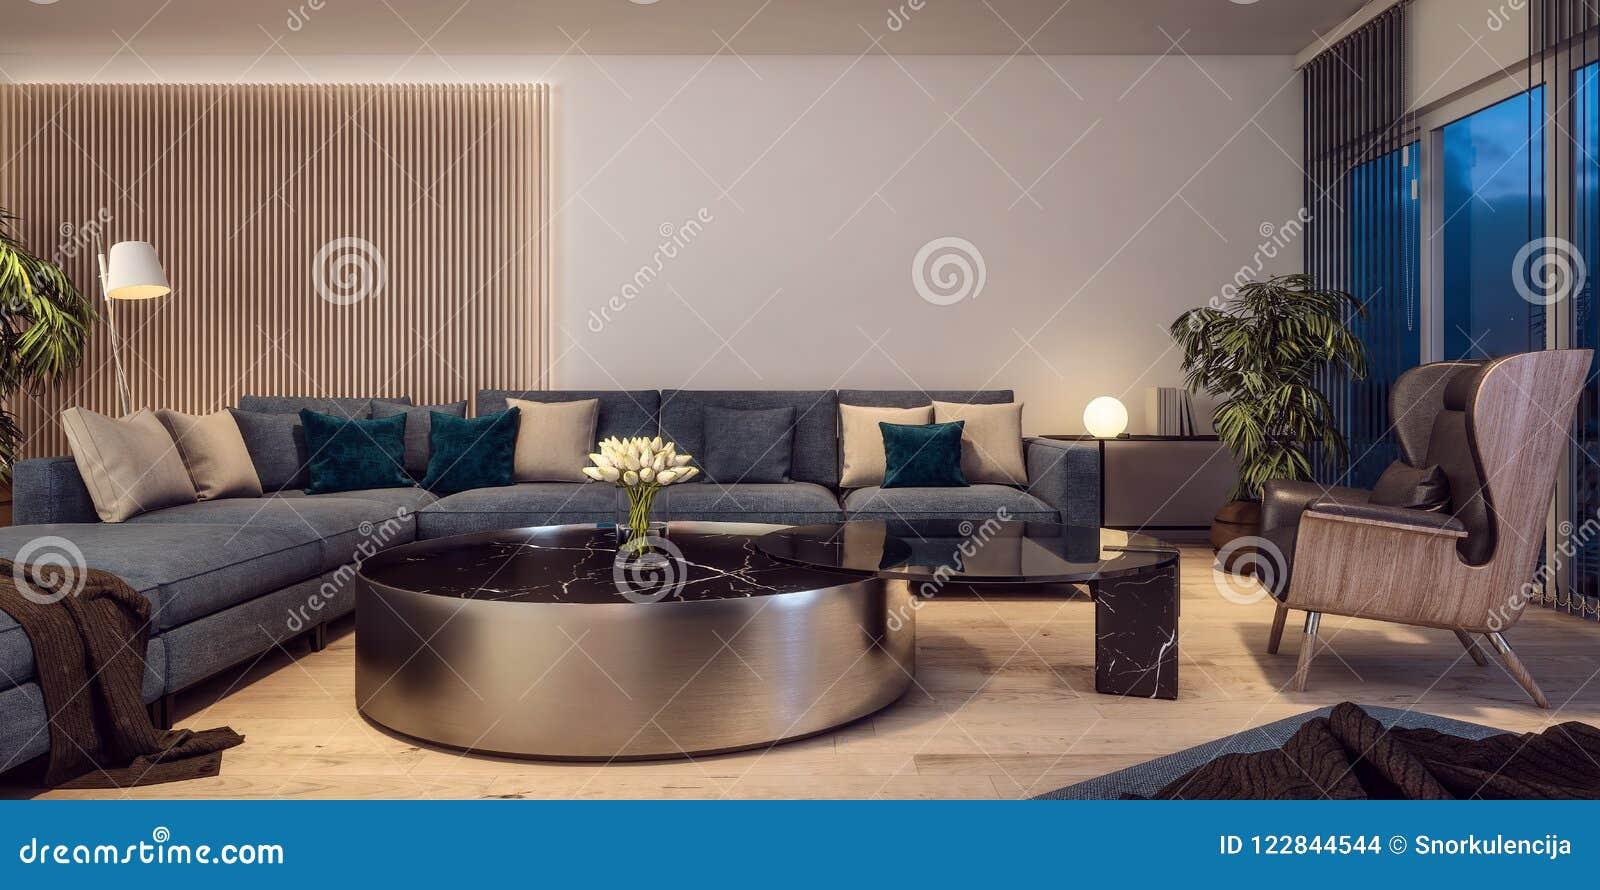 Design de interiores moderno da sala de visitas italiana do estilo, cena da noite